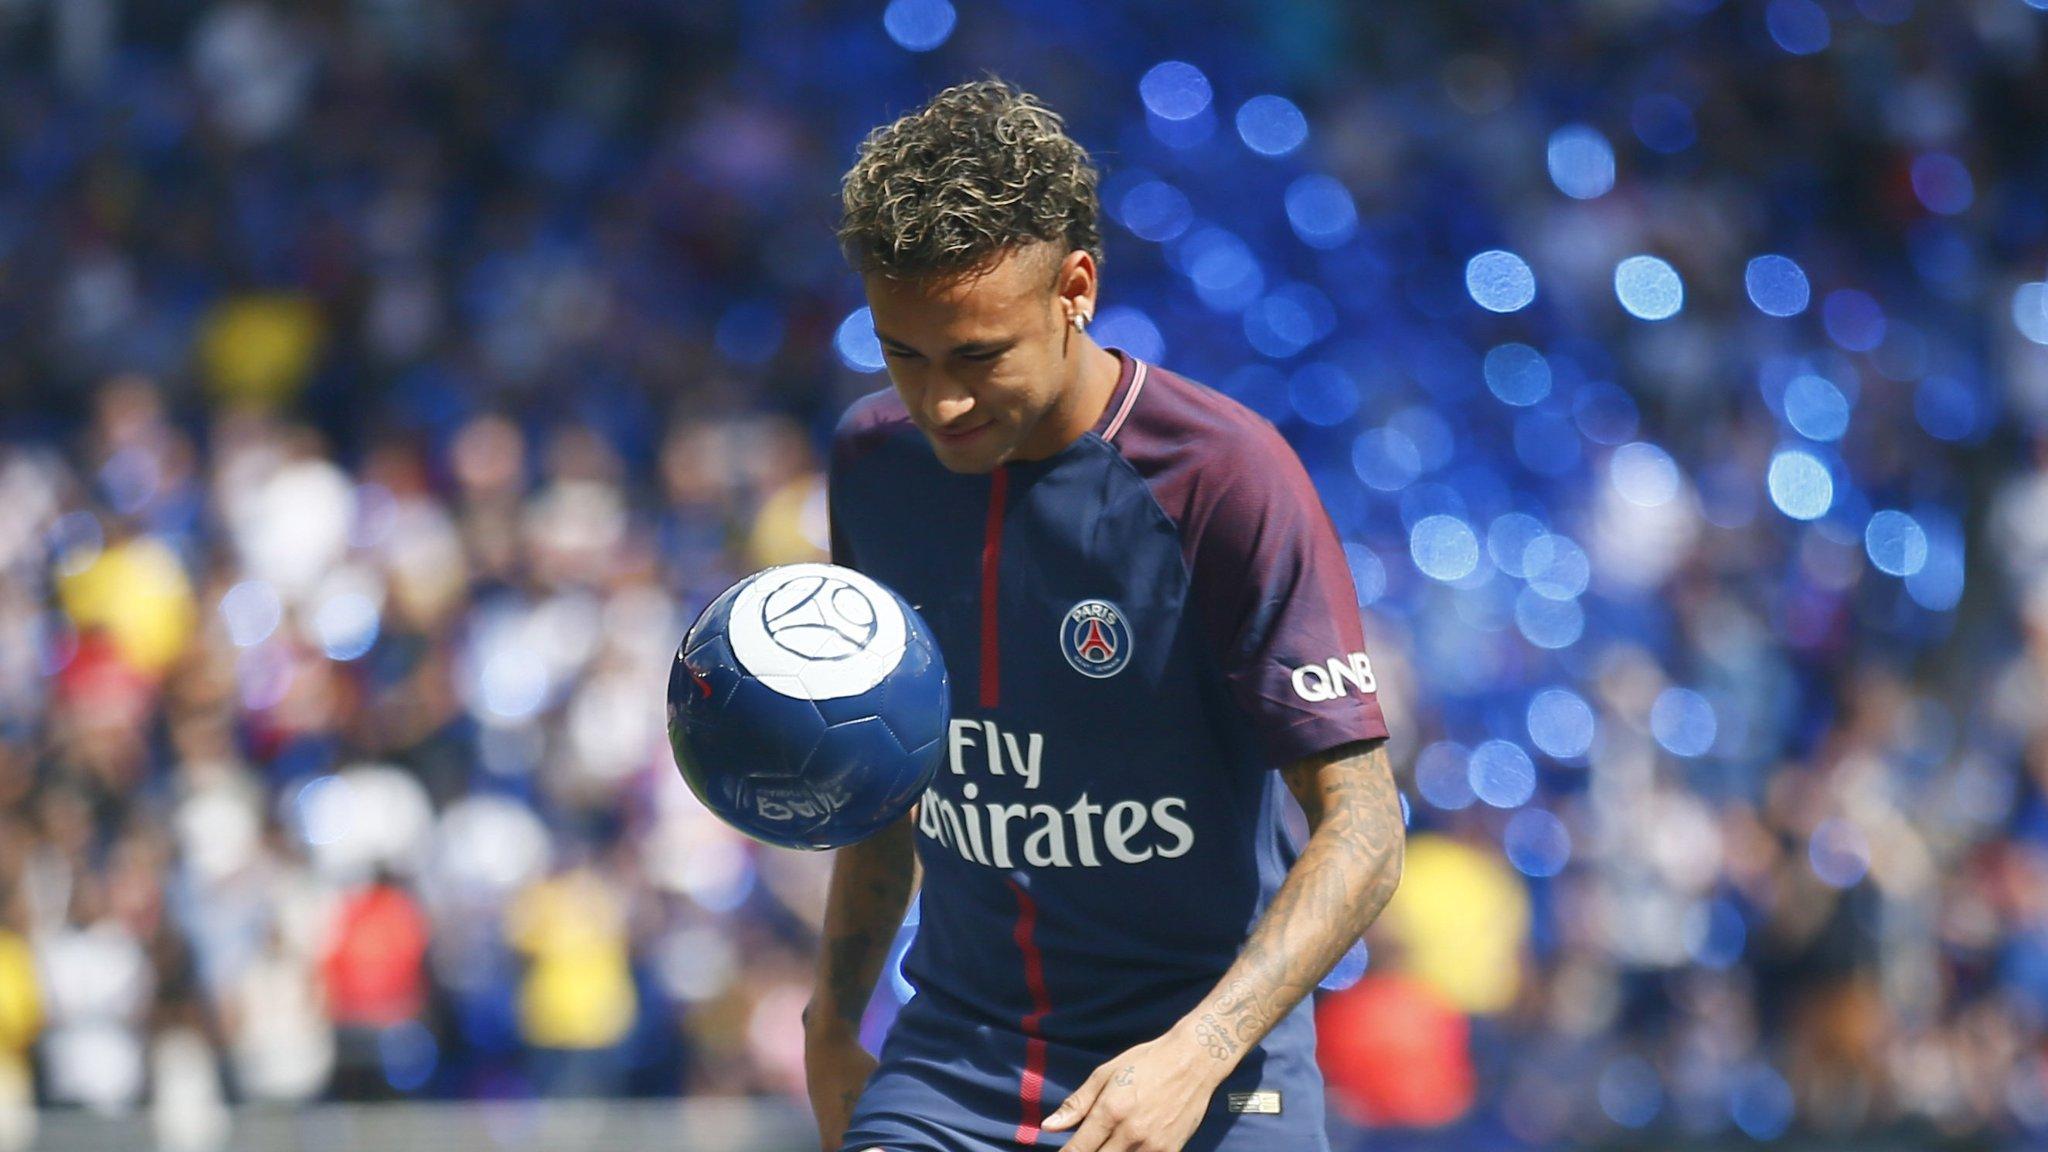 e1e6a24bf68d1 Neymar transfer exposes football's modern-day trafficking scheme ...